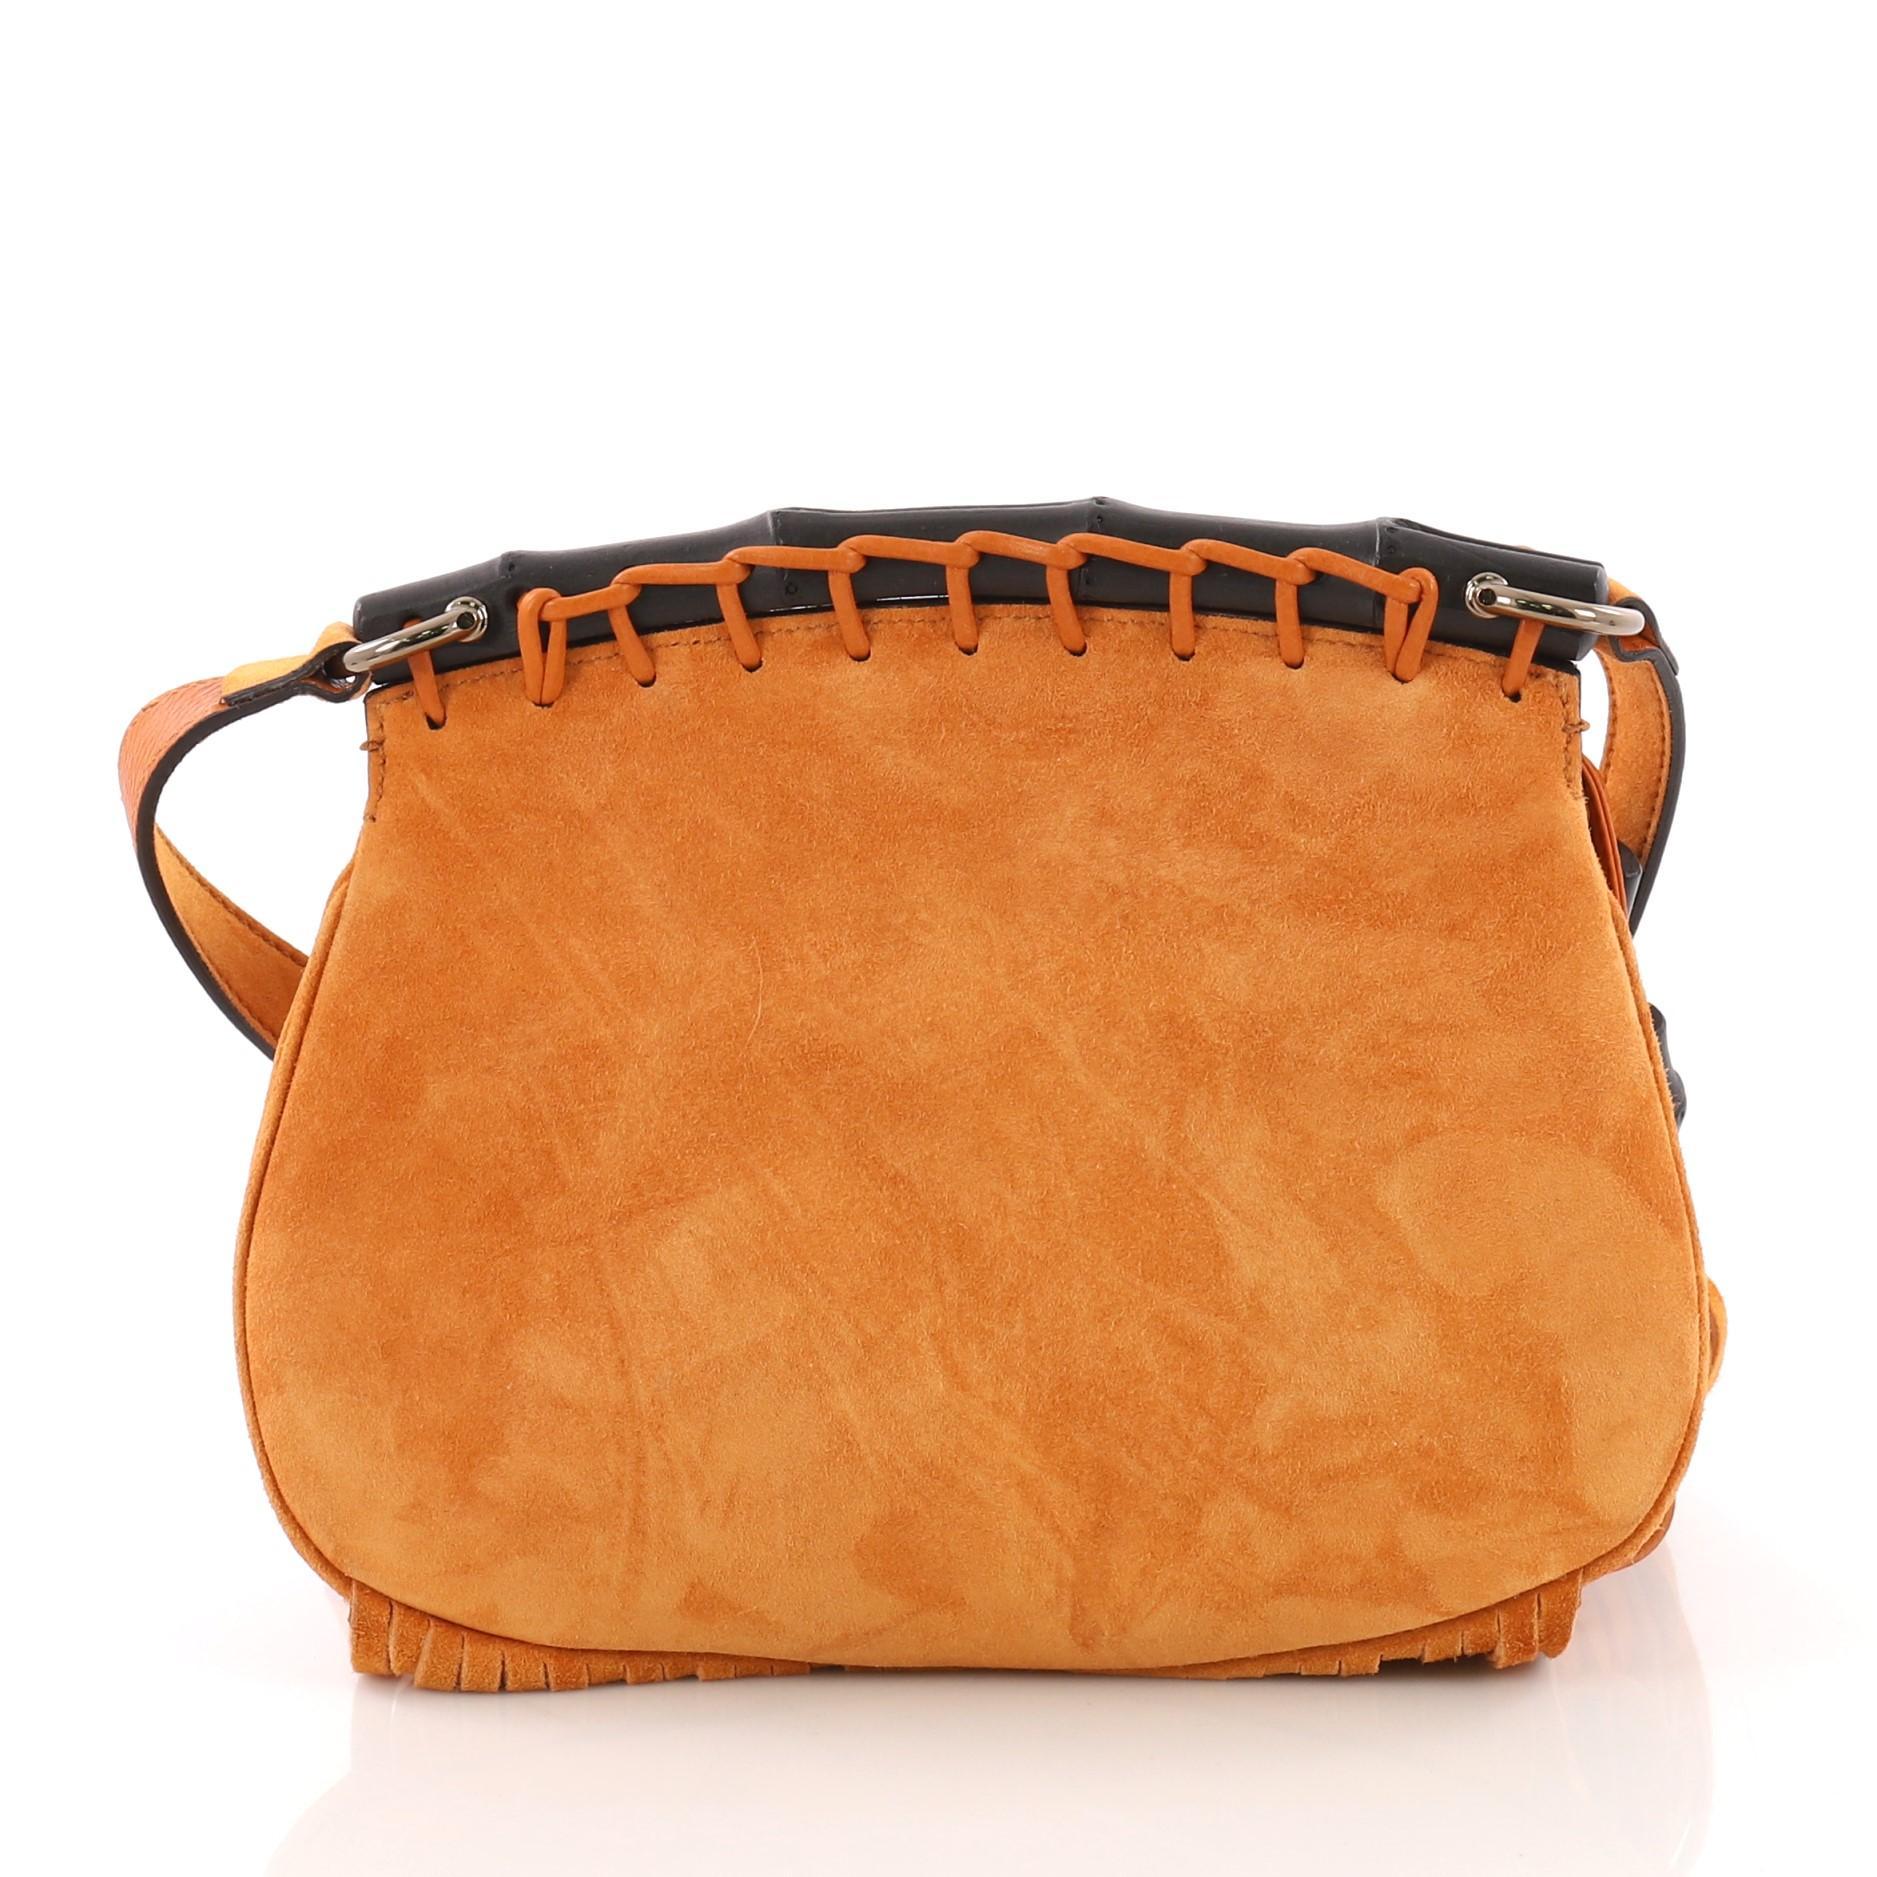 c15adb2c9de Gucci Nouveau Fringe Crossbody Bag Suede Small at 1stdibs